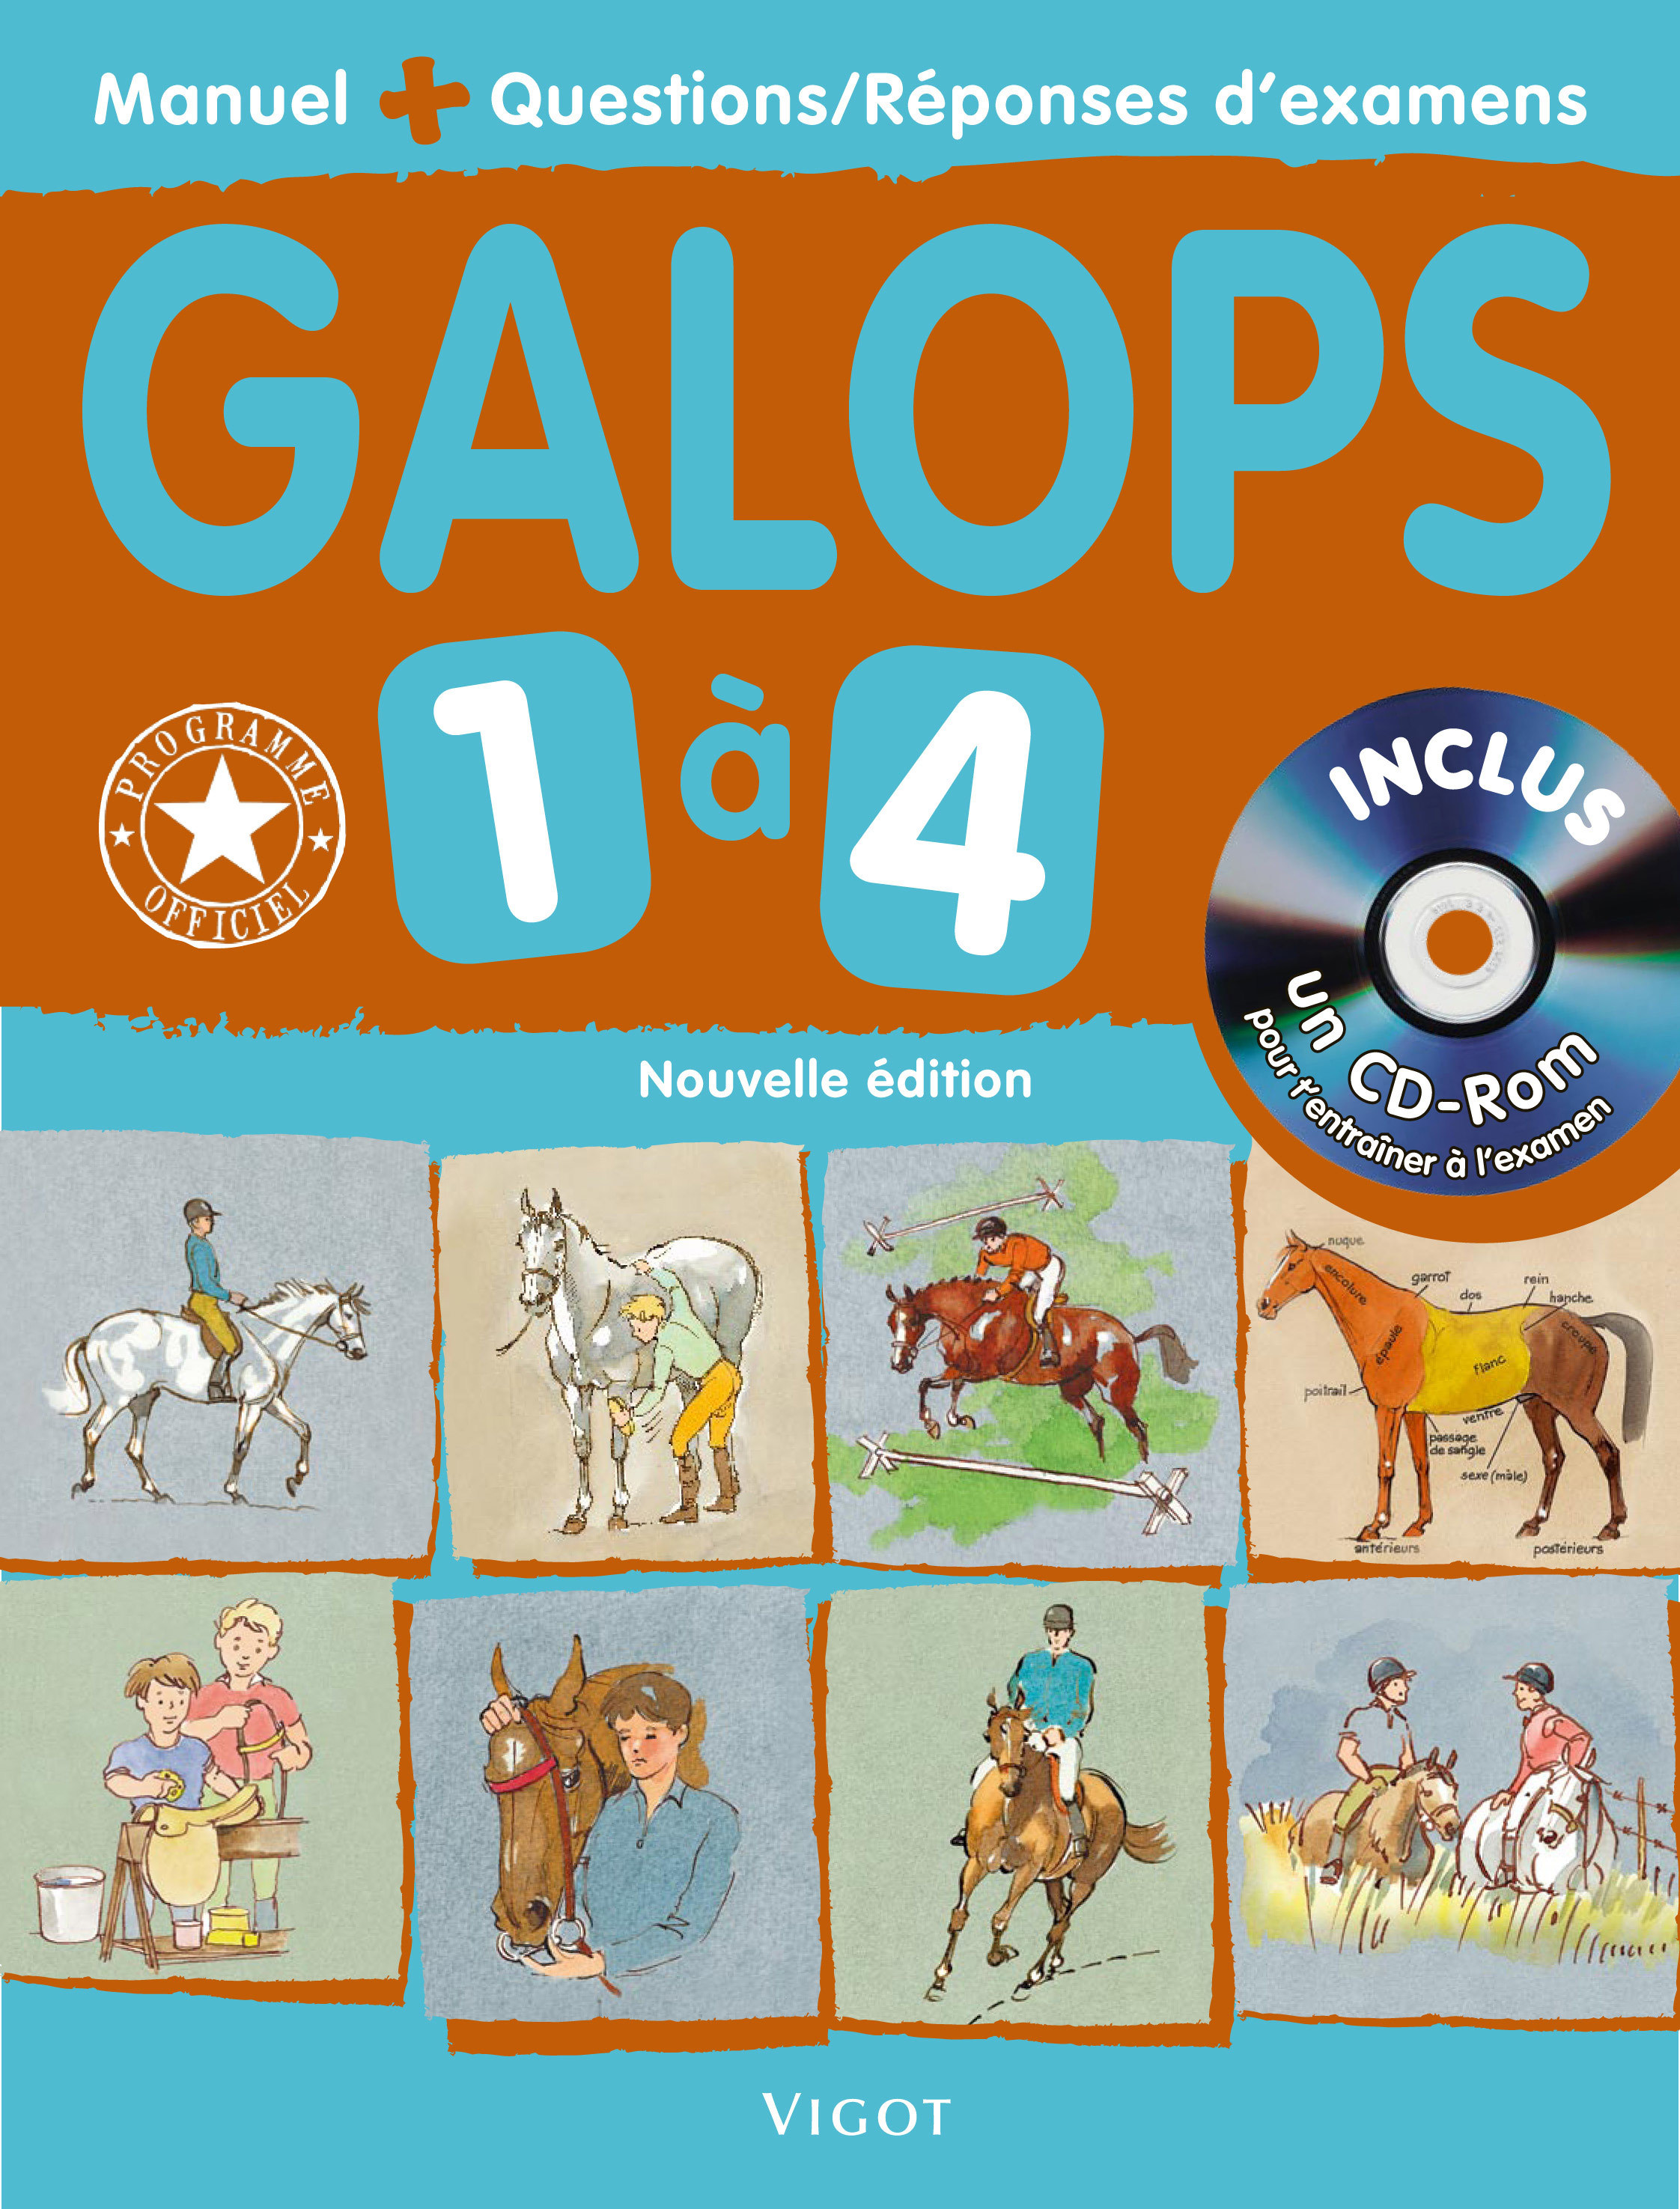 GALOPS 1 A 4 AVEC CD ROM